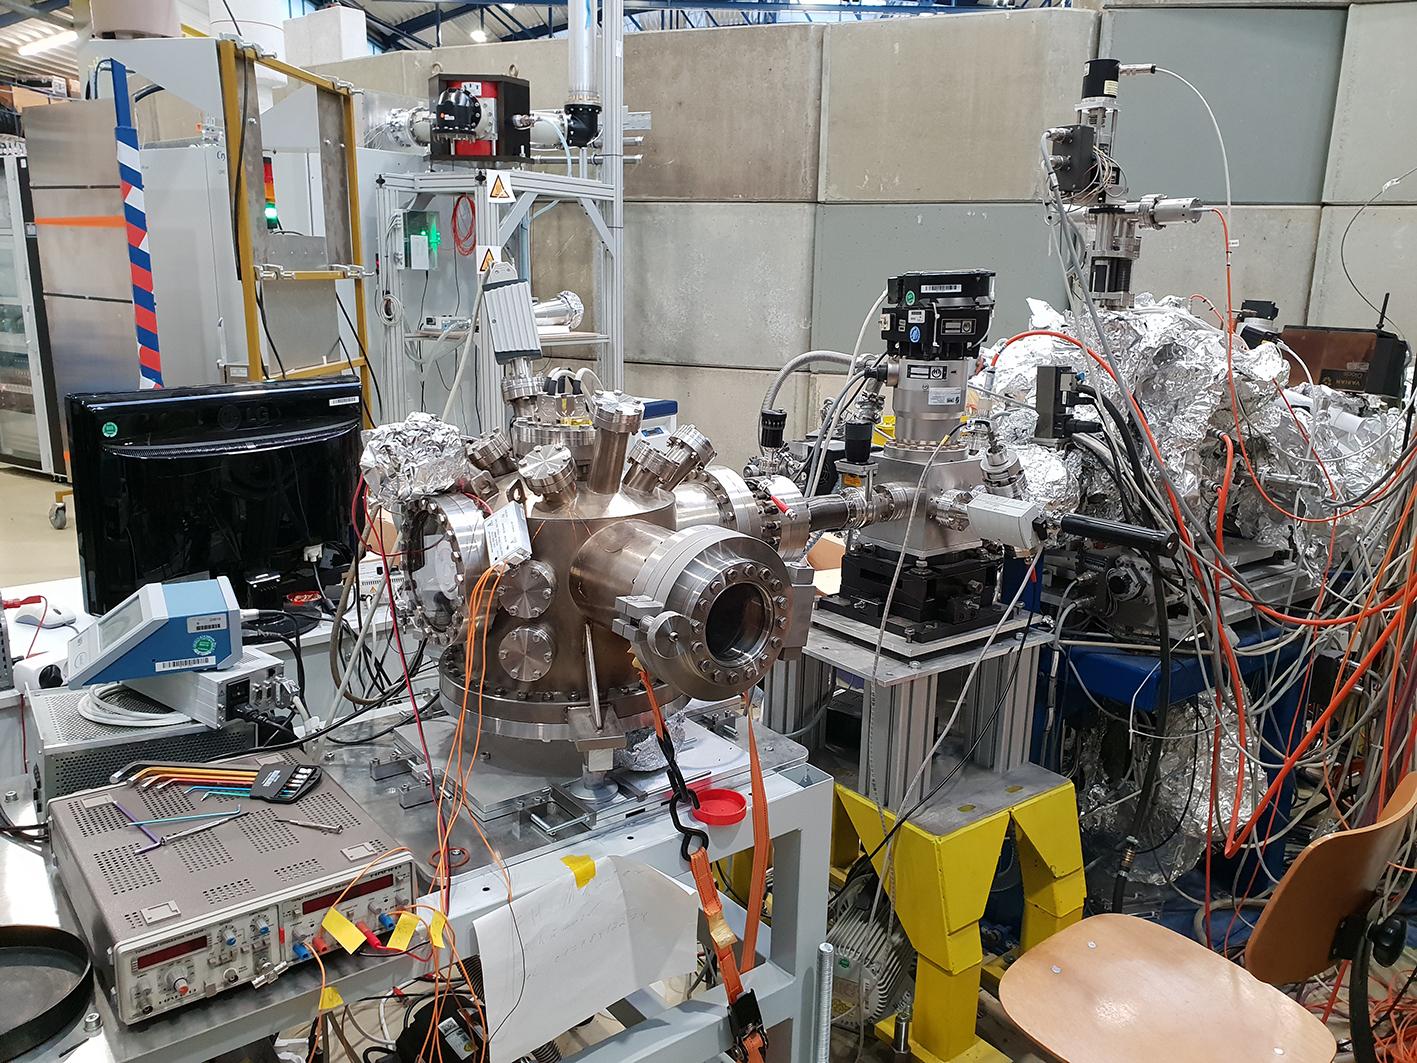 Mikroskop, Kabel, Computer, mit Alufolie umwickelte Leiter